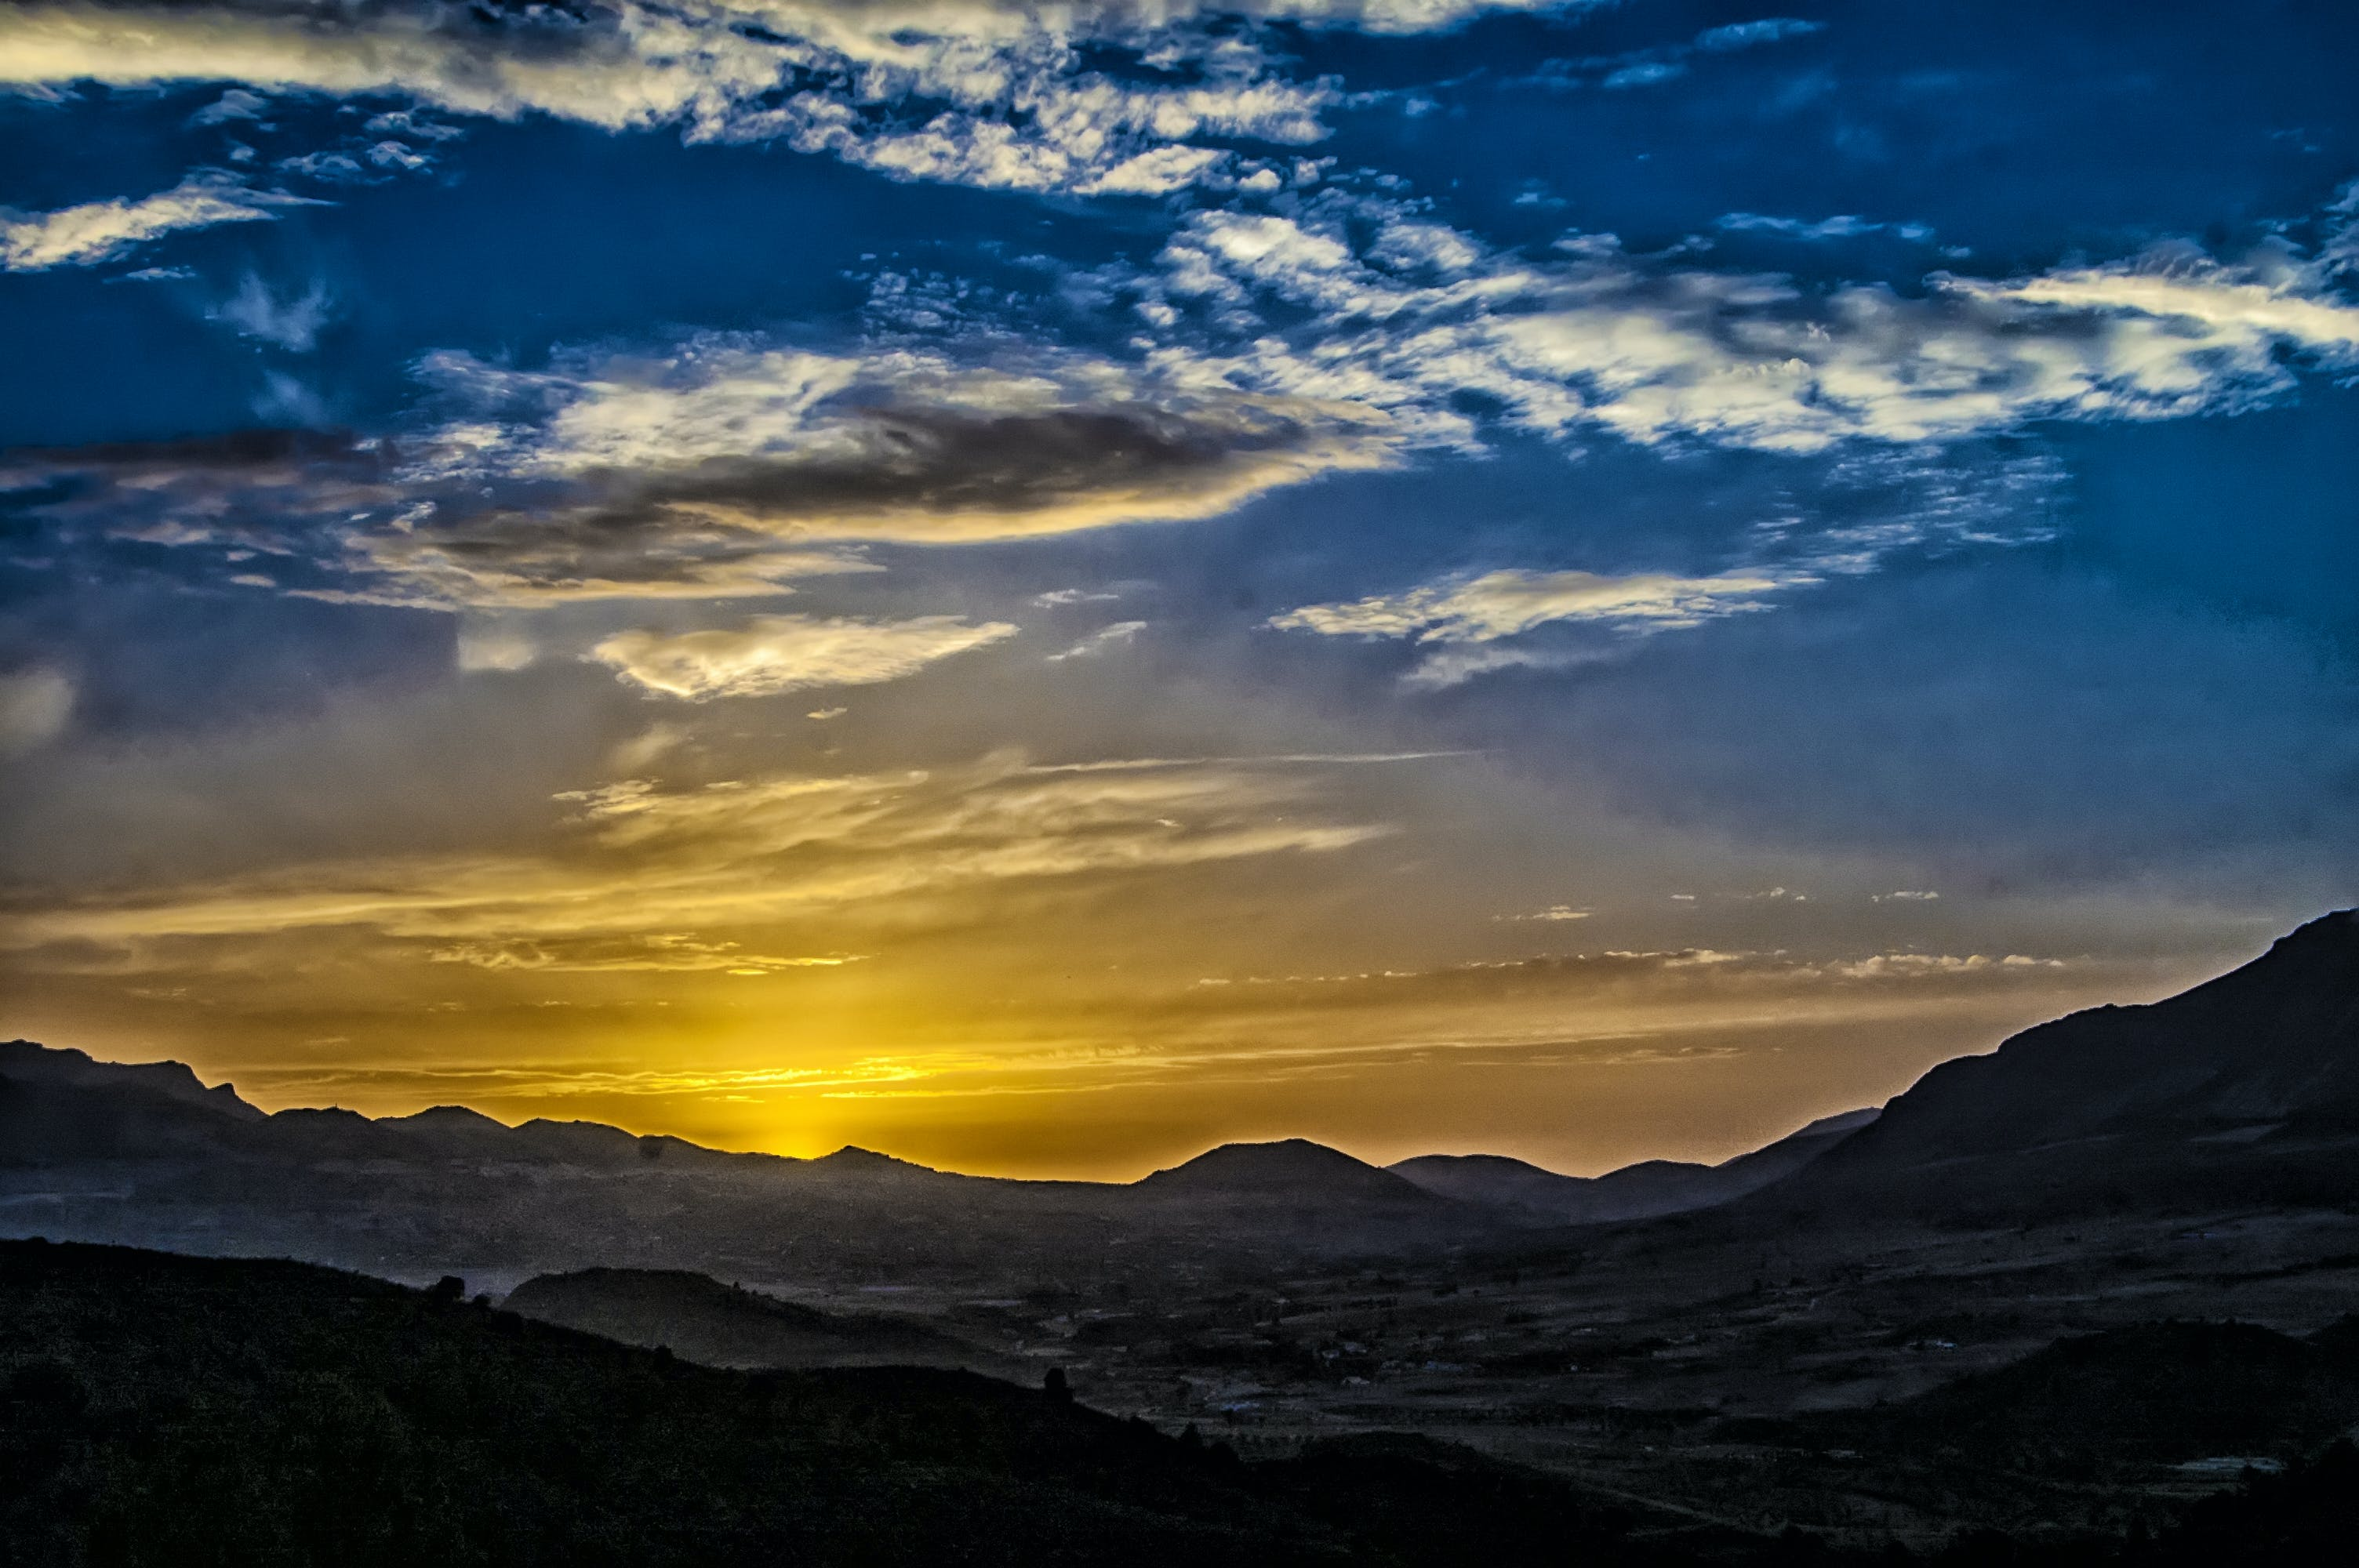 Kostenloses Stock Foto zu himmel, horizont, landschaft, natur